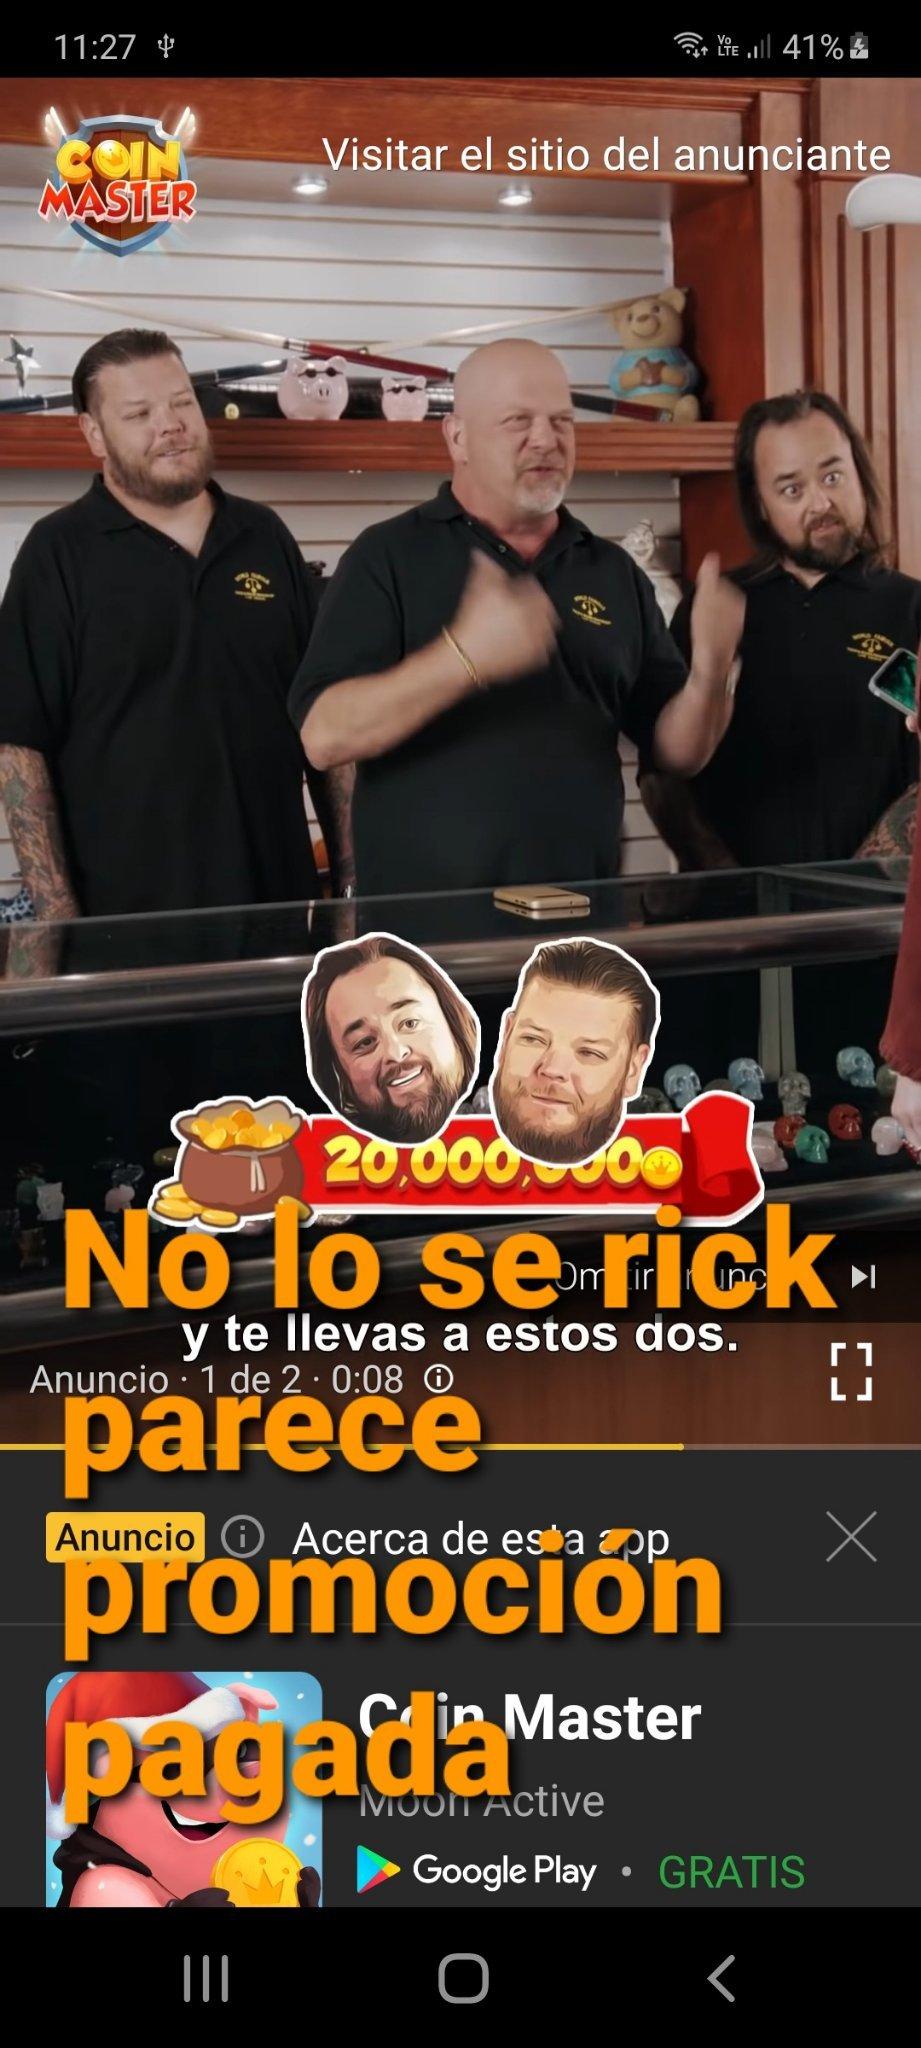 No lo c rick parece promicion pagada - meme